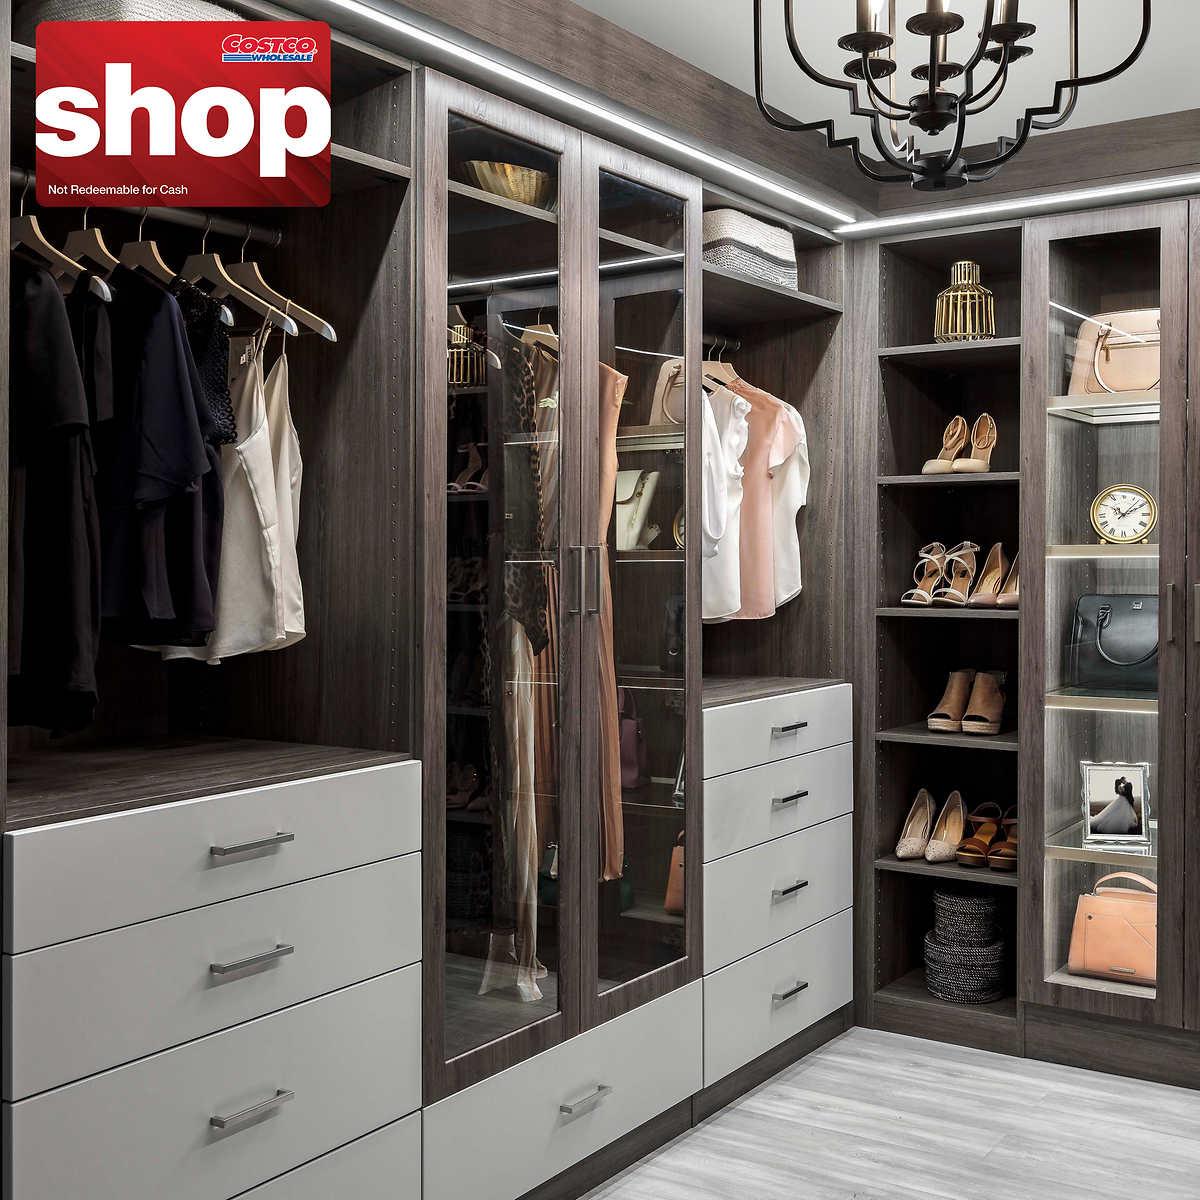 Rubbermaid Closet Shoe Storage